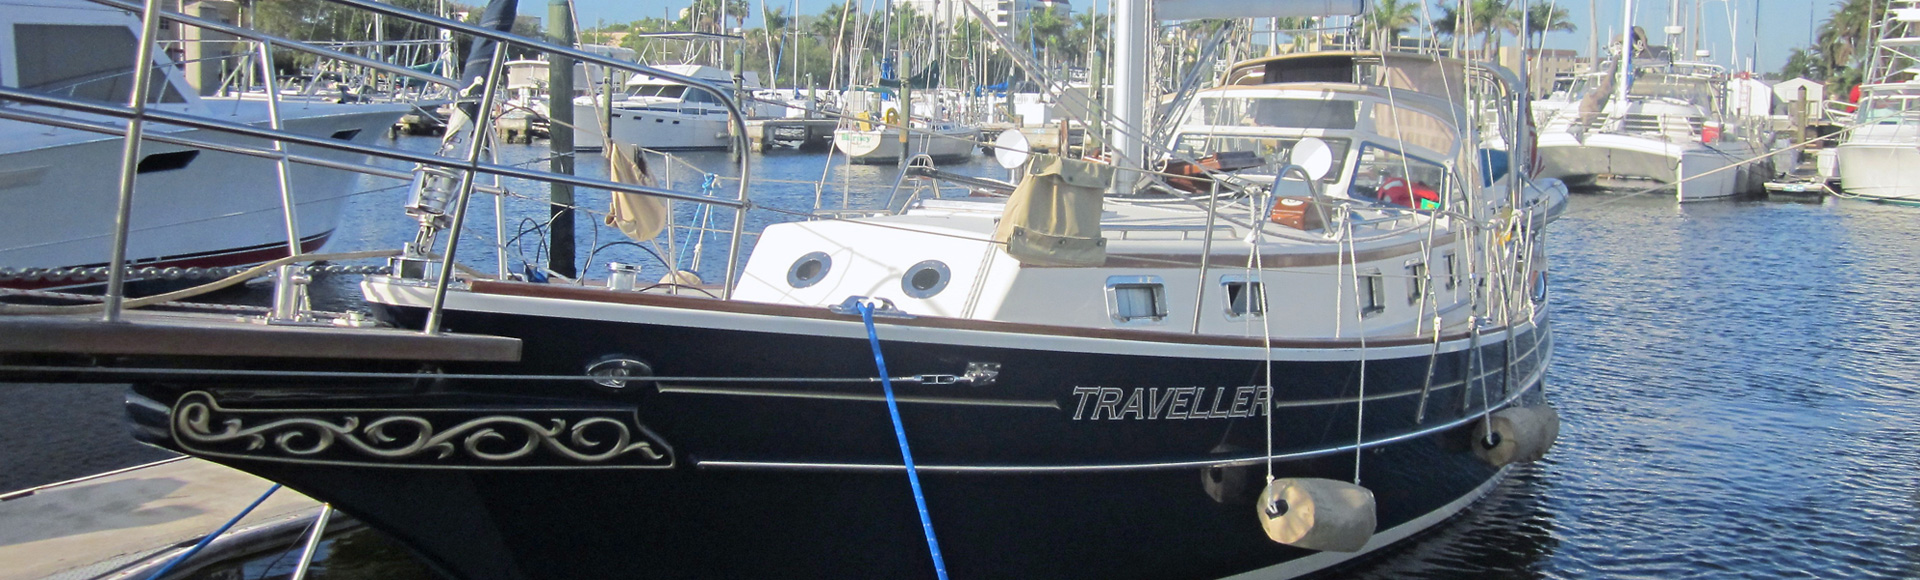 "SALE PENDING – 2002 Gozzard 37A Hull #12 ""Traveller"""